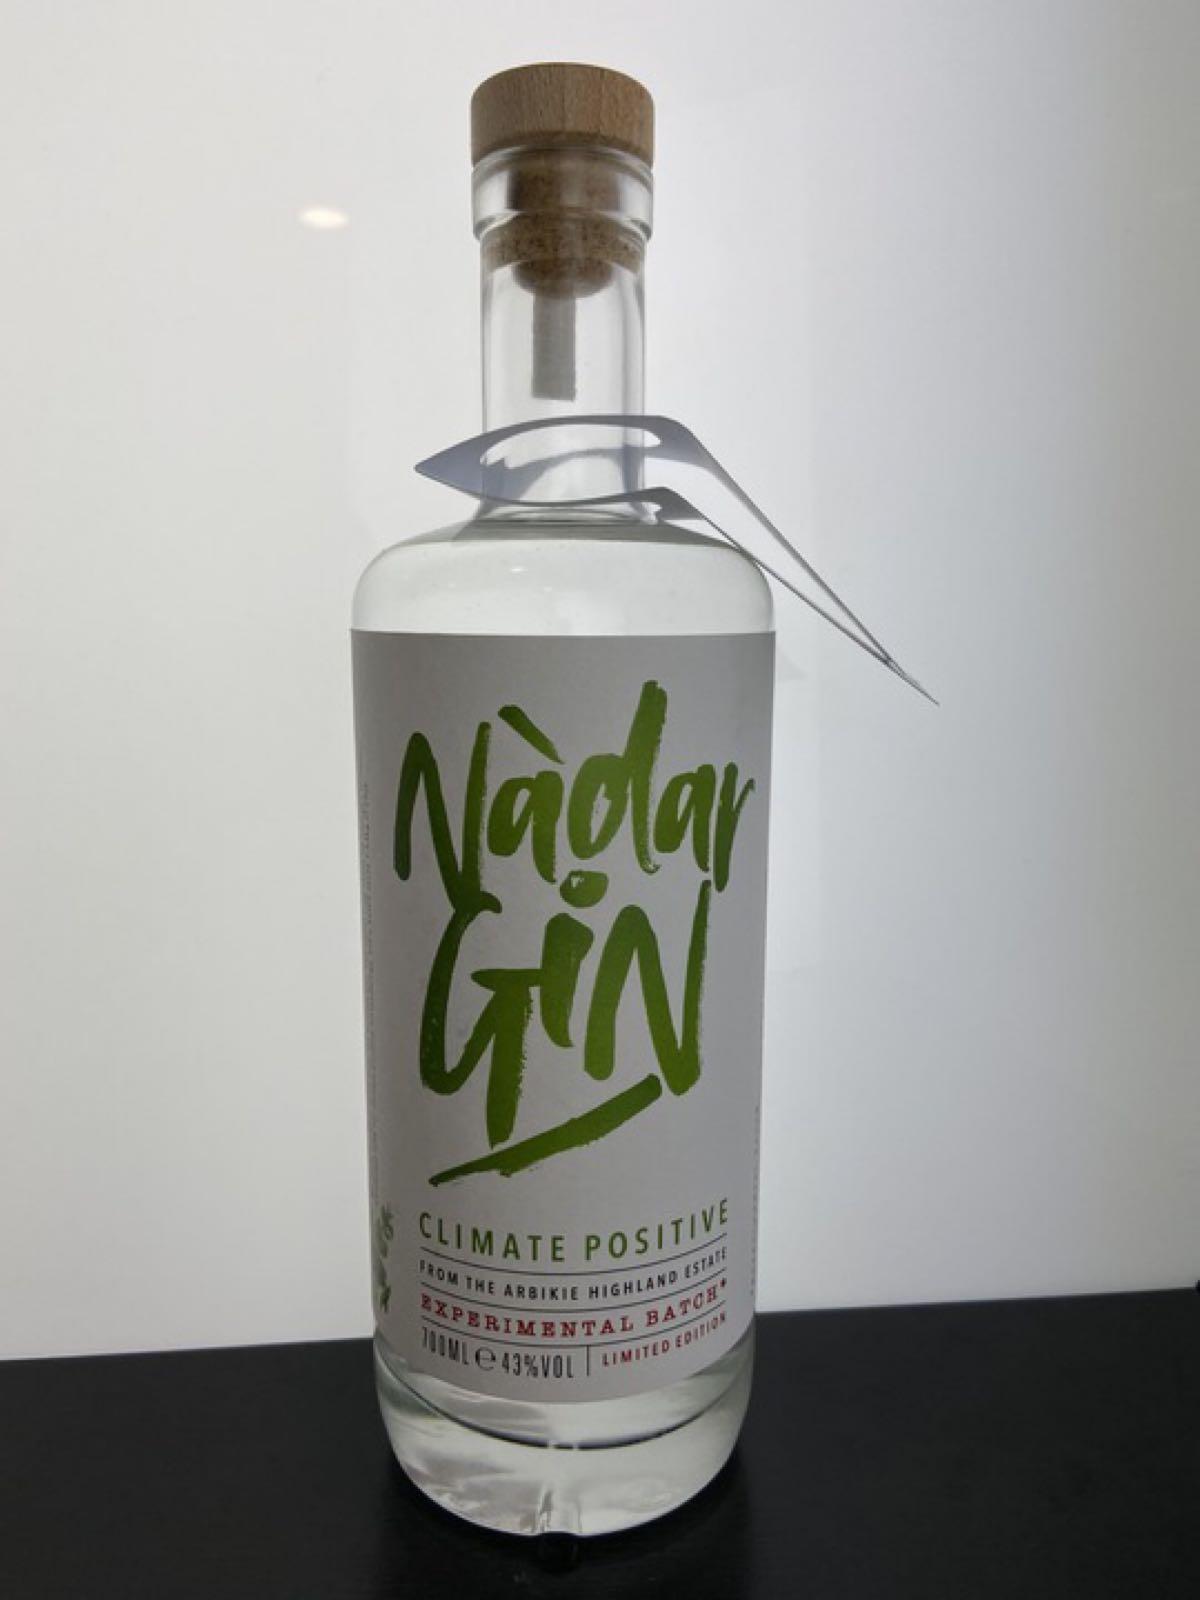 Arbikie: Nadar Gin (climate positive)